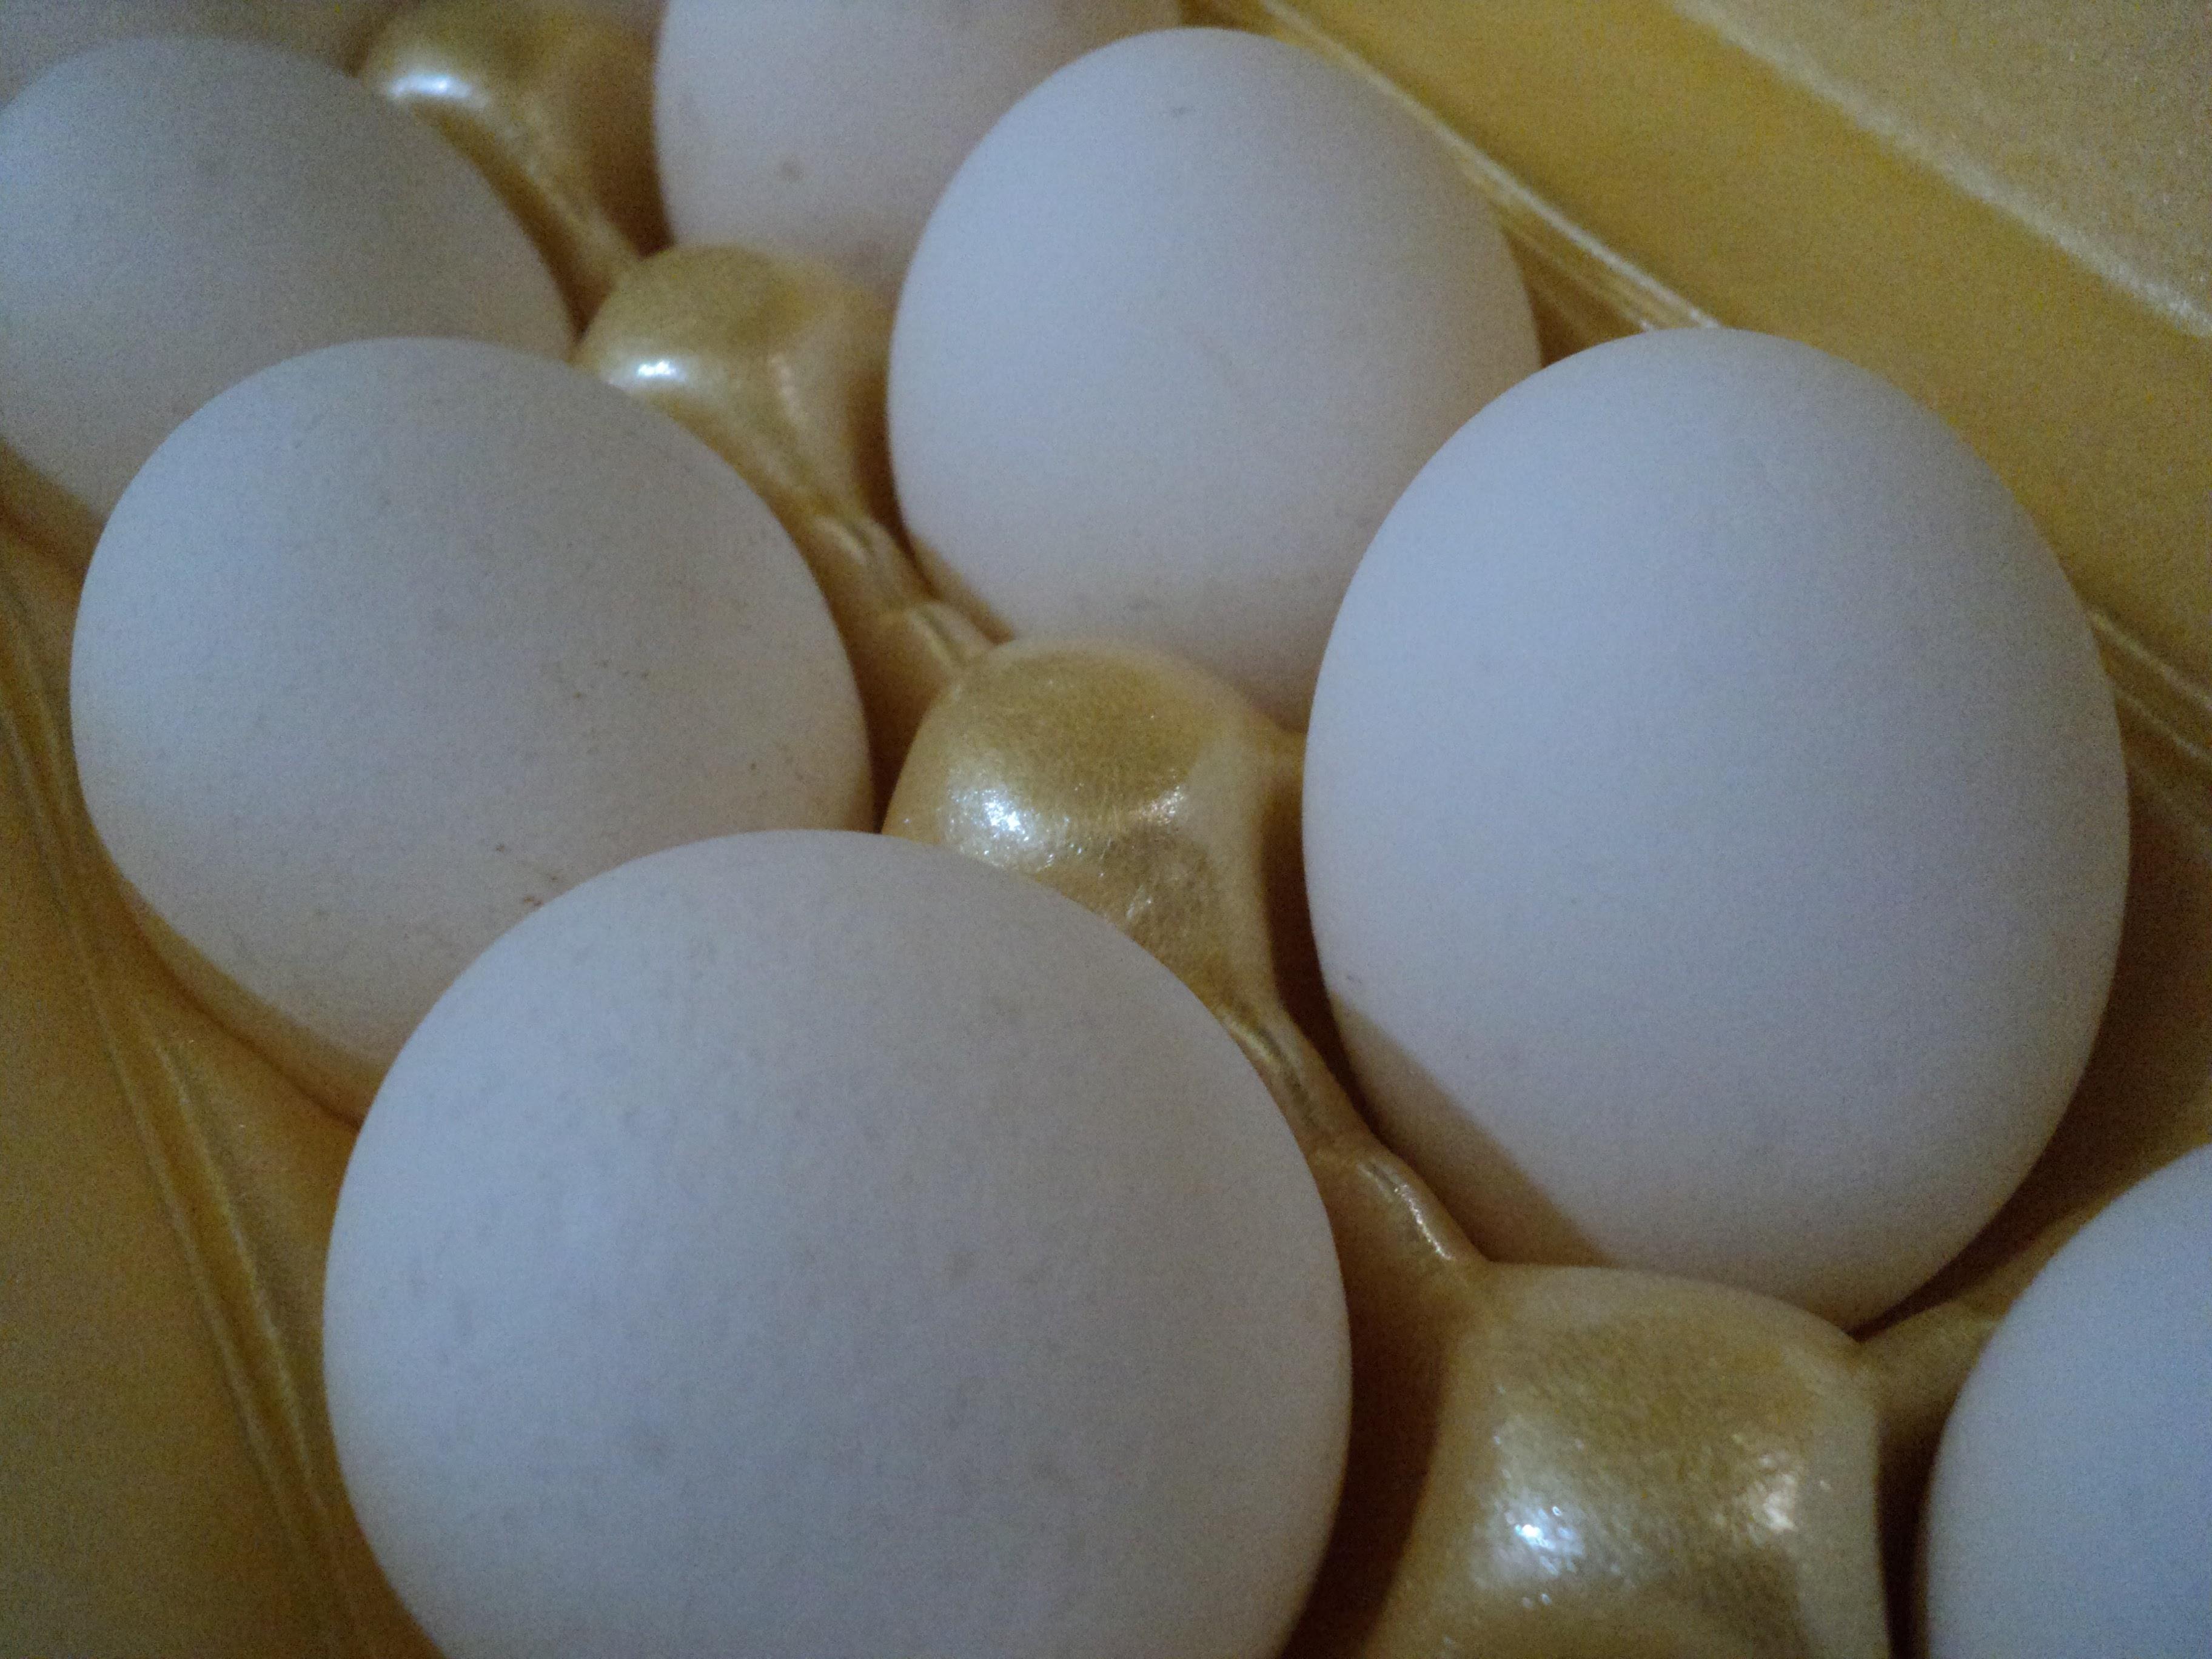 Free photograph; egg, kitchen, close